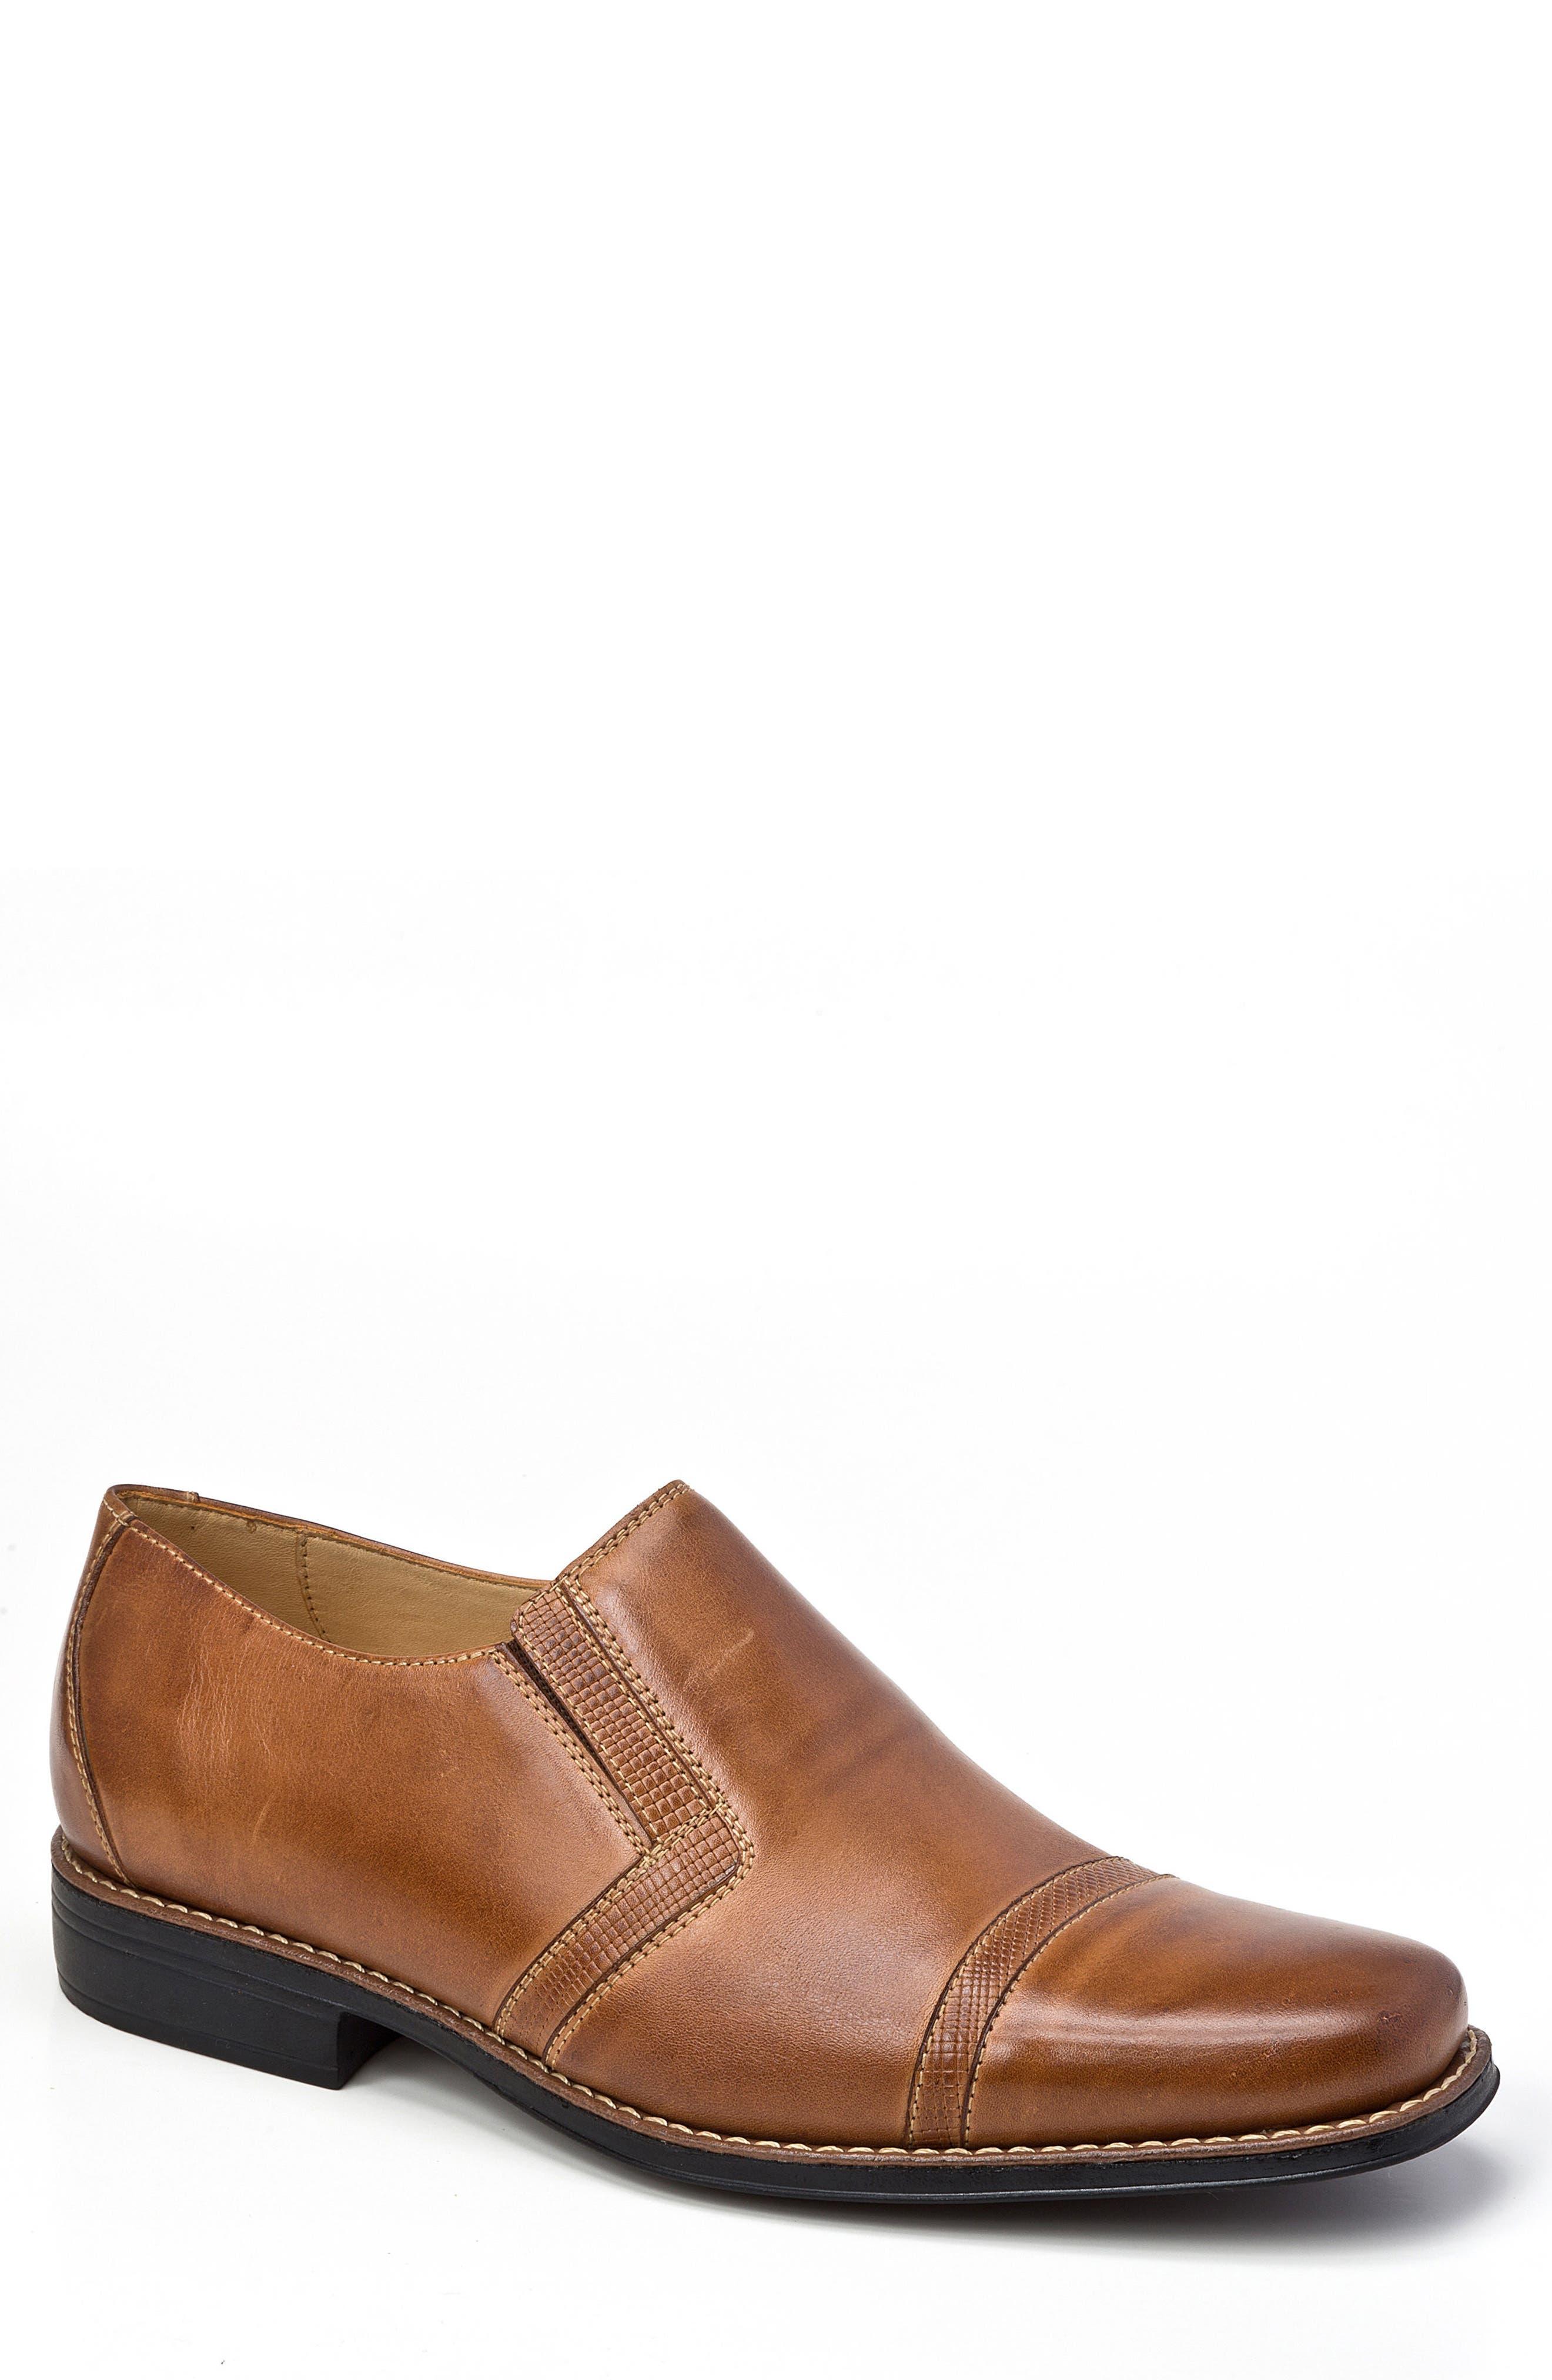 Sebastian Venetian Loafer,                             Main thumbnail 1, color,                             Tan Leather